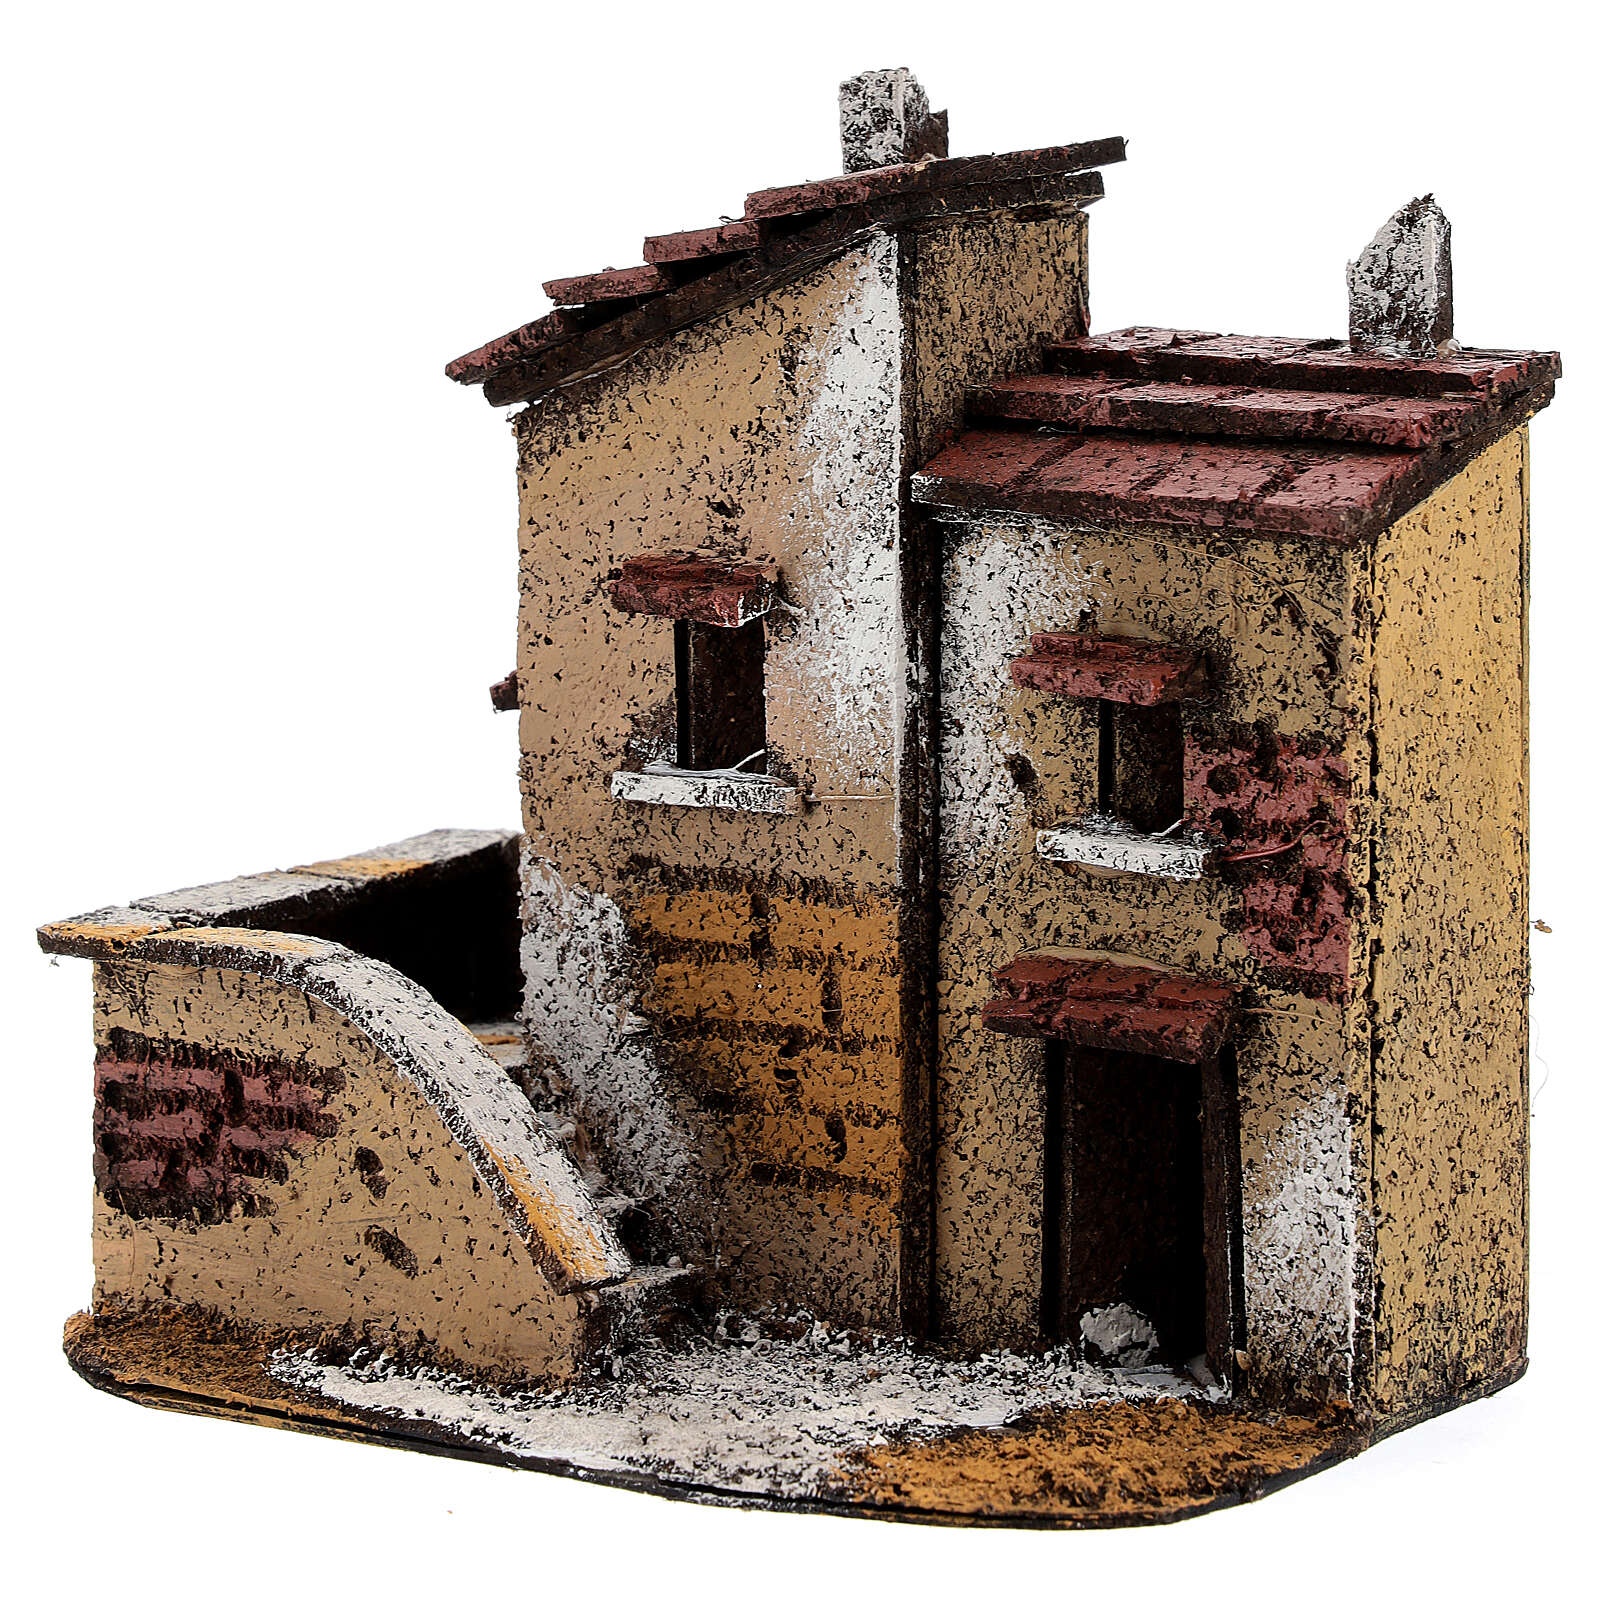 Couple of miniature cork houses 15x15x10 Neapolitan Nativity scene 3 cm 4